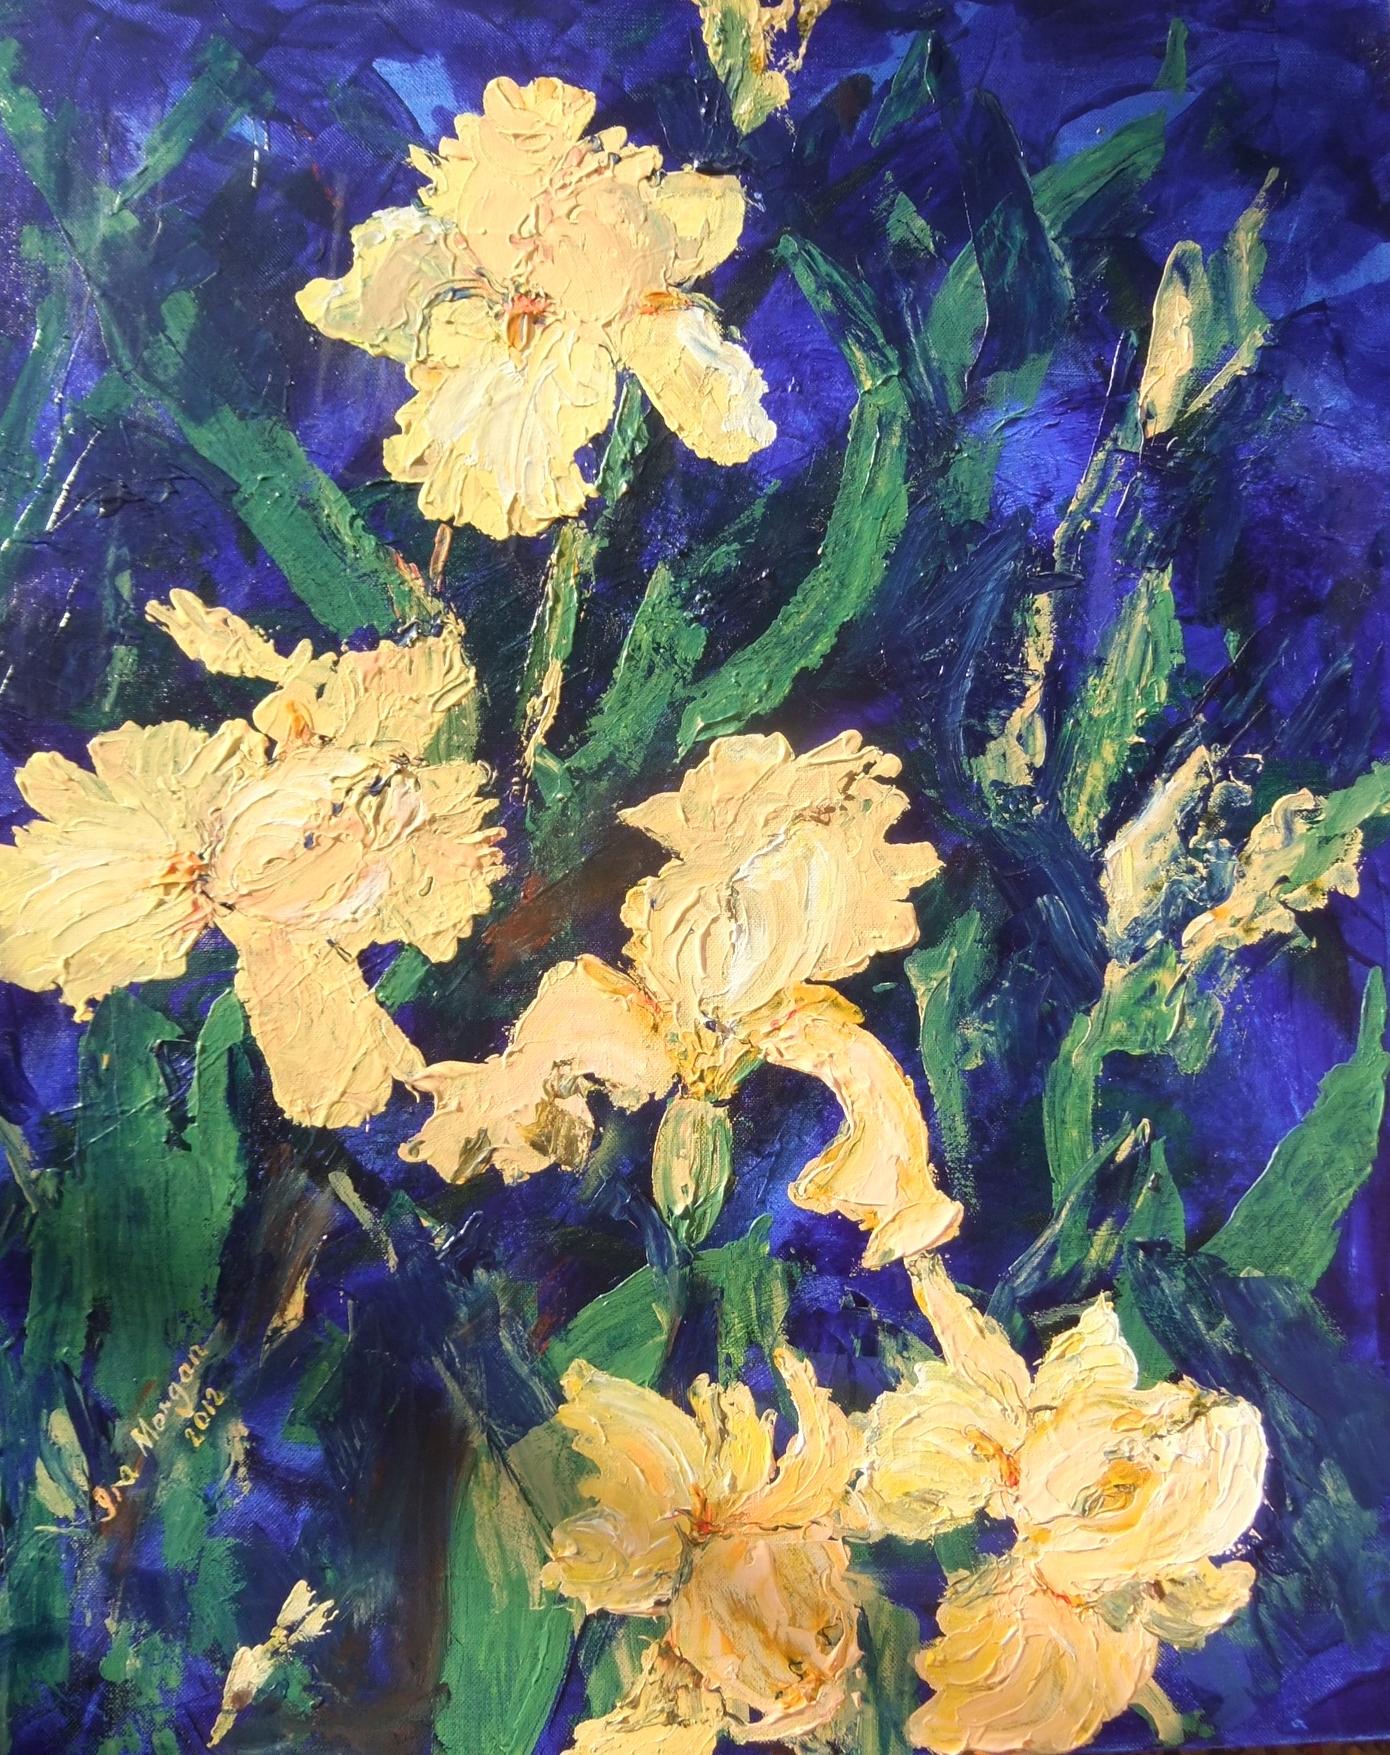 160. ' Buttery Irises'